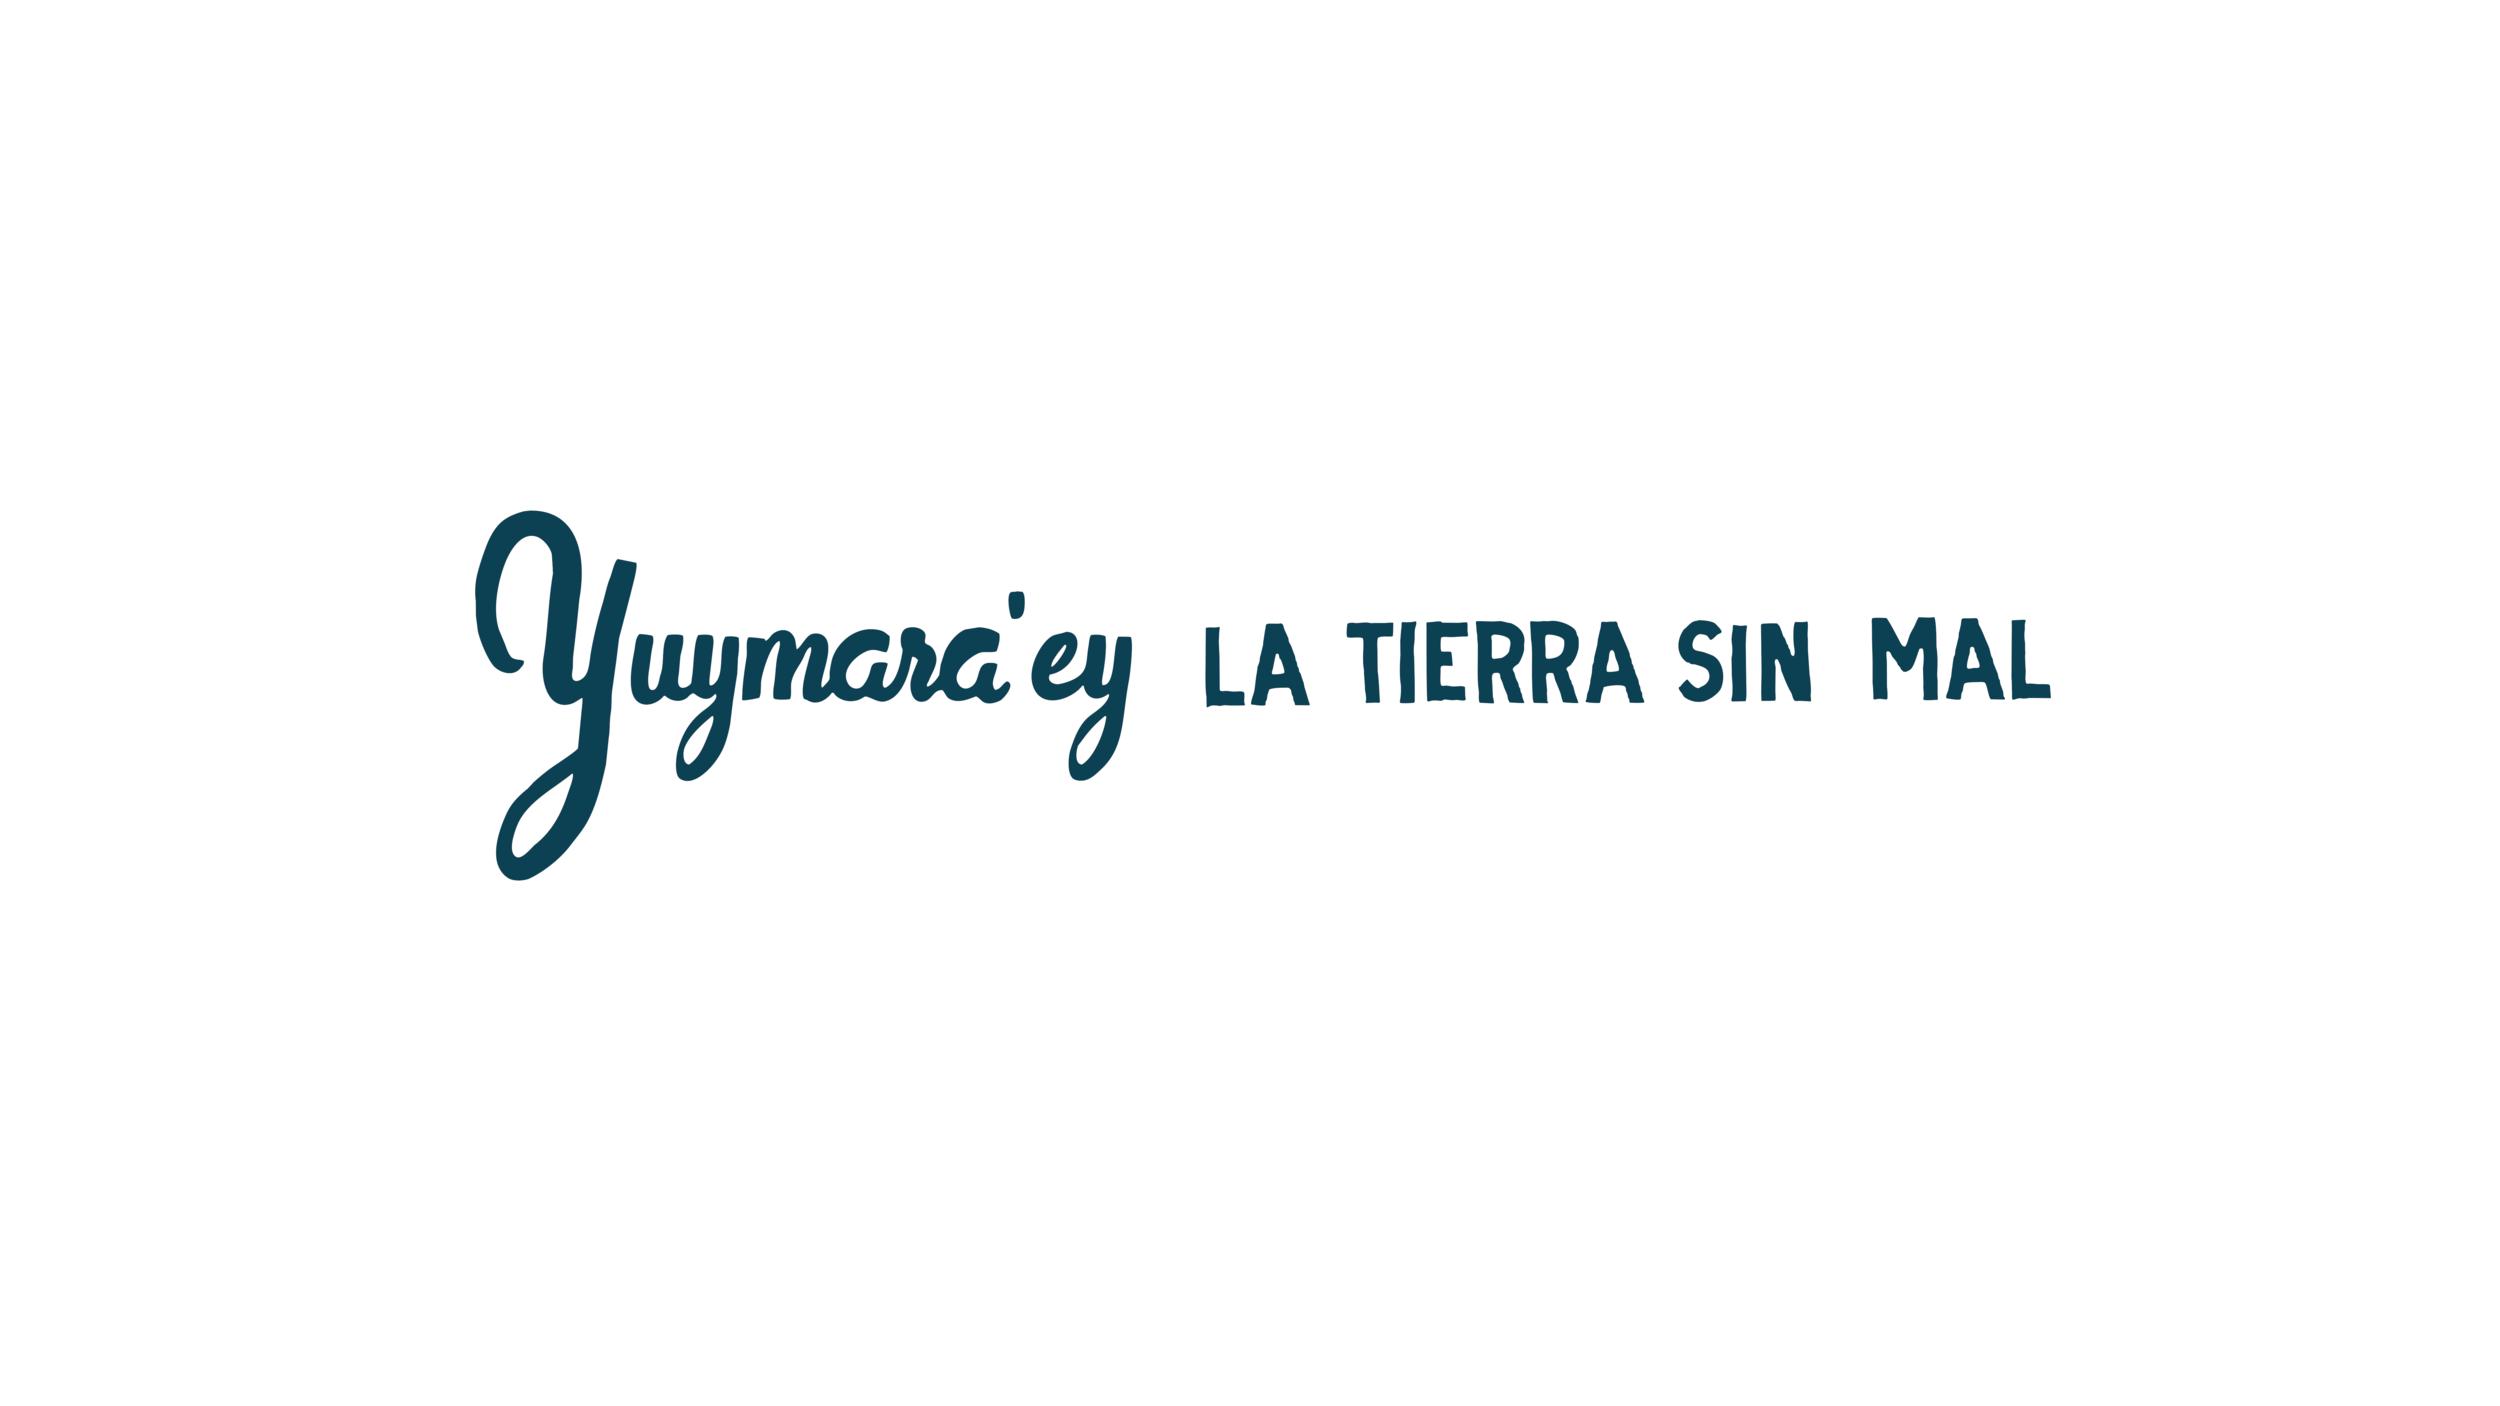 yuymara-fondo-blanco.png